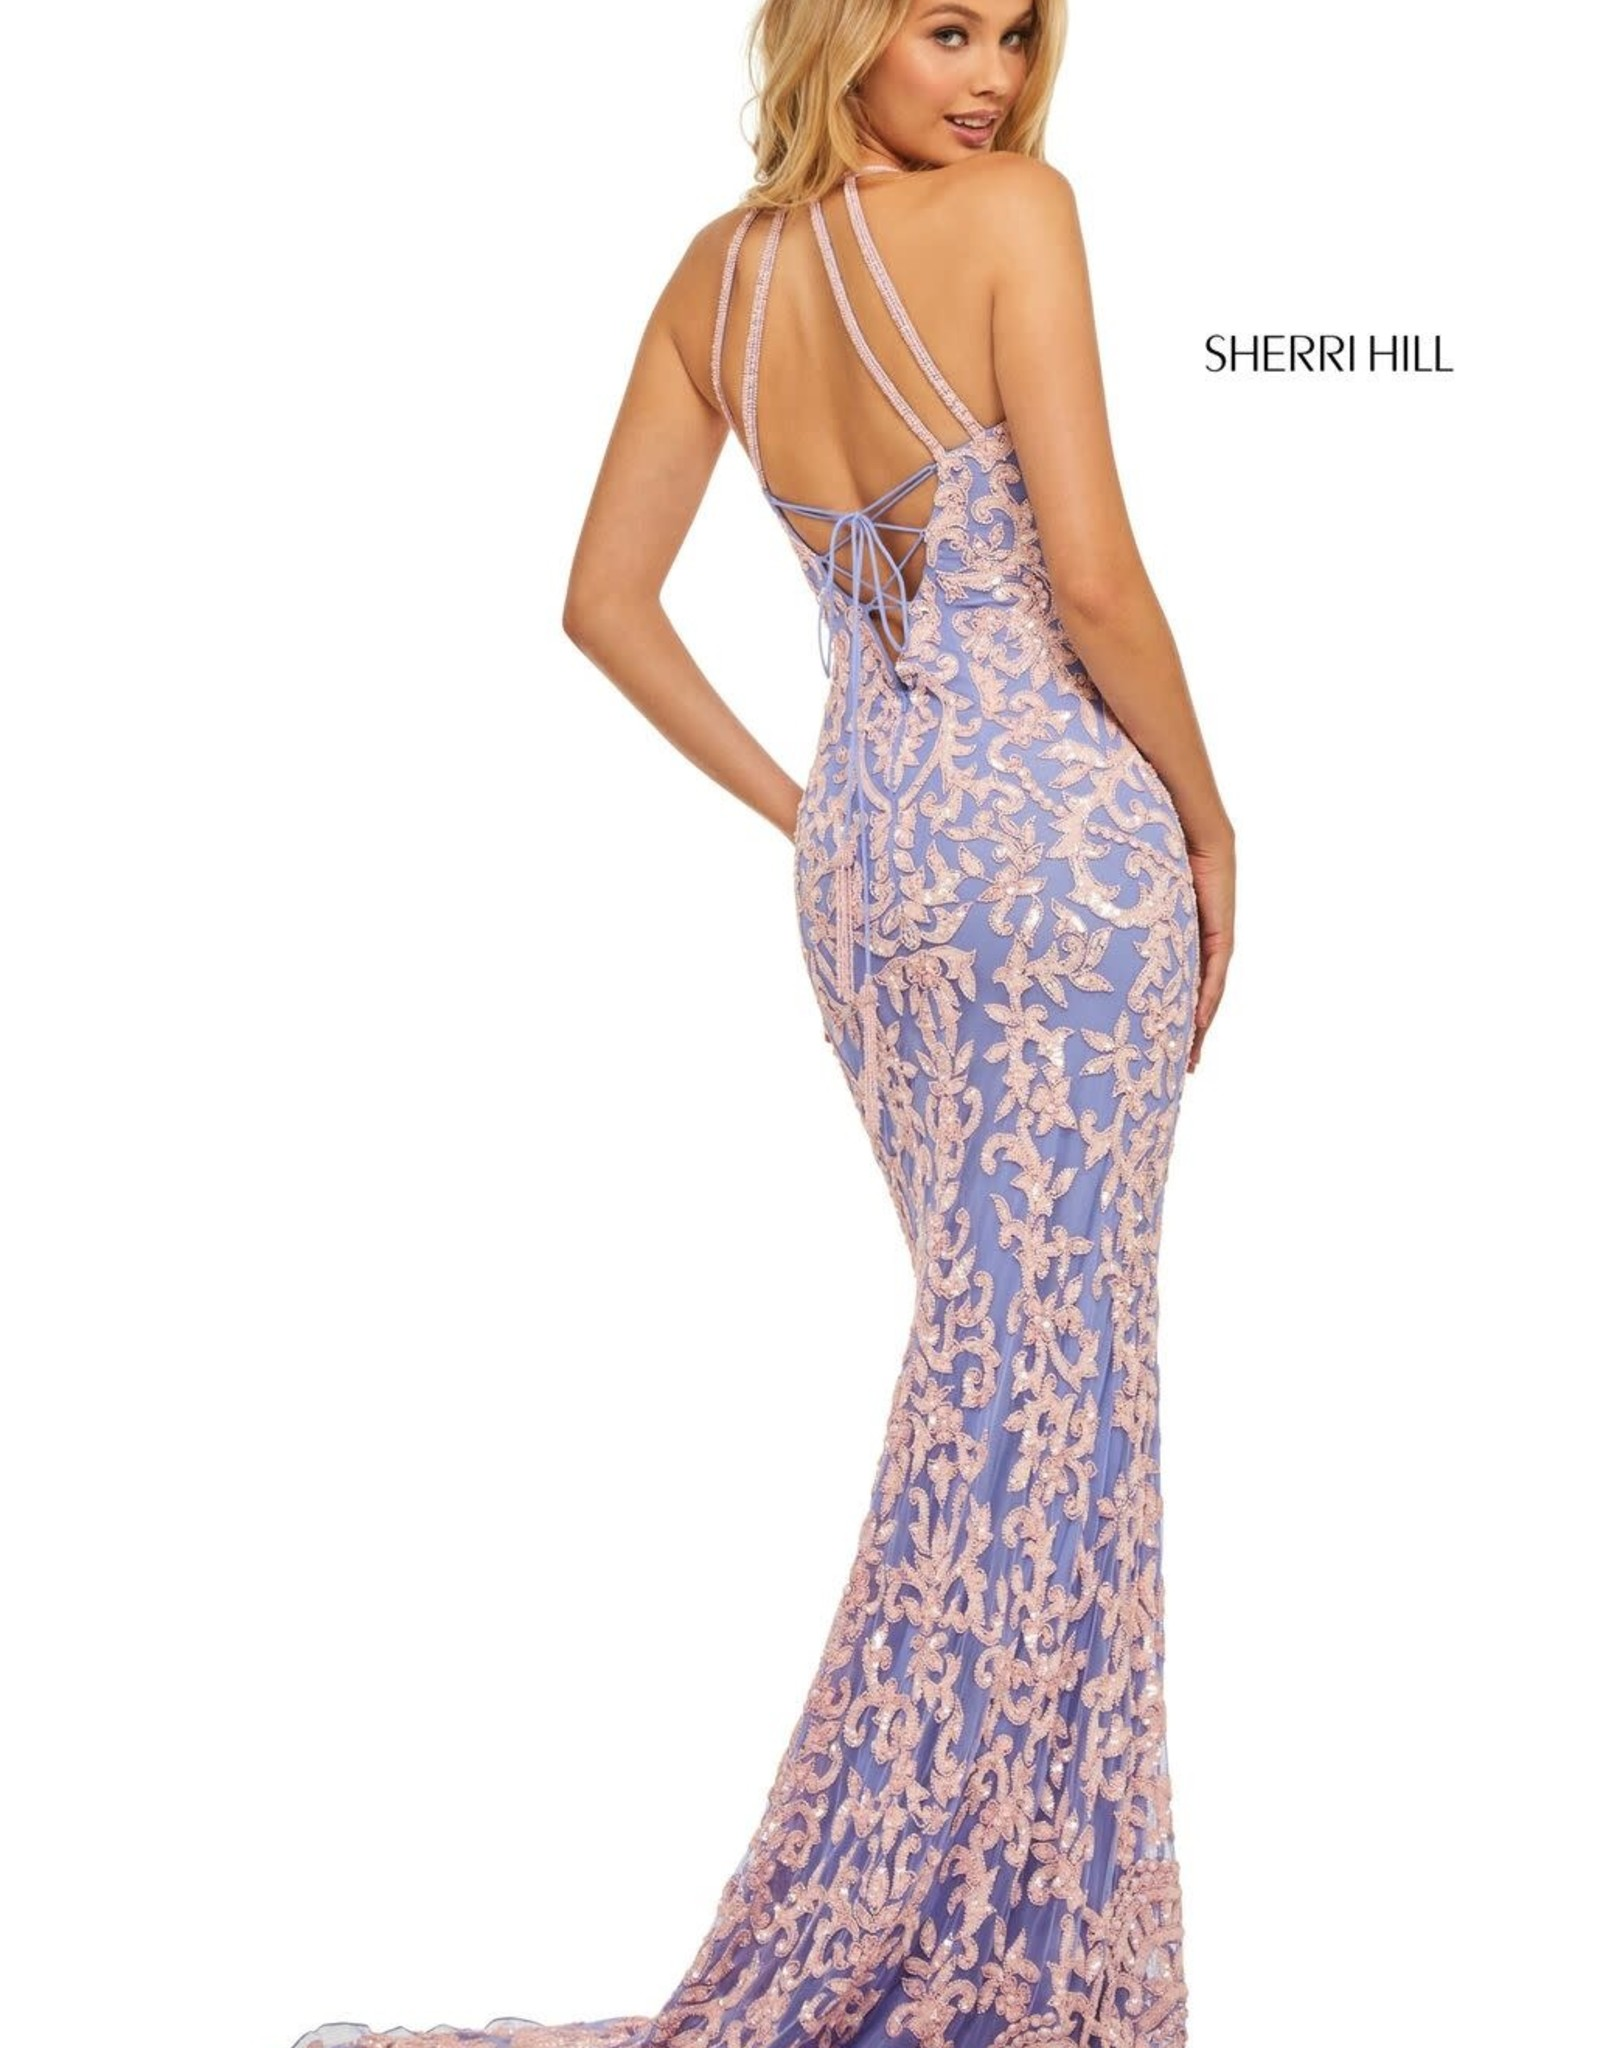 Sherri Hill Sherri Hill Periwinkle 0